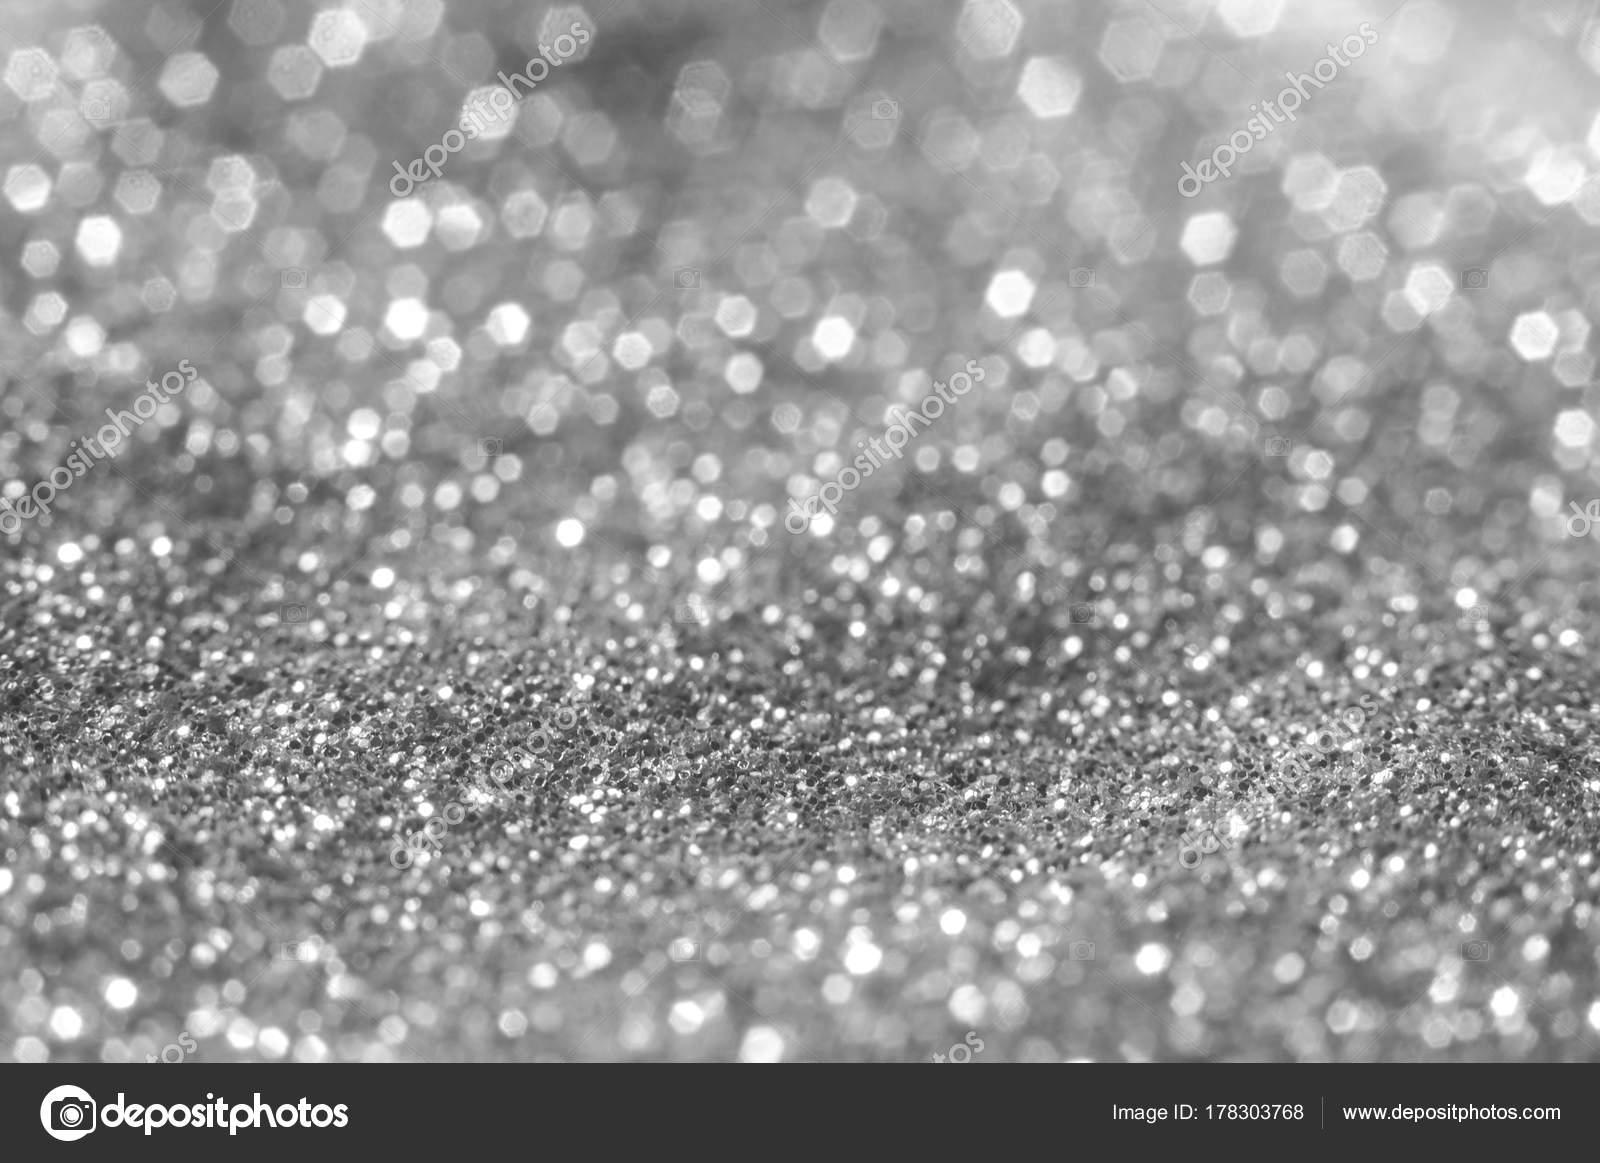 Riepilogo di brillante e scintillante di bokeh. argento e diamanti